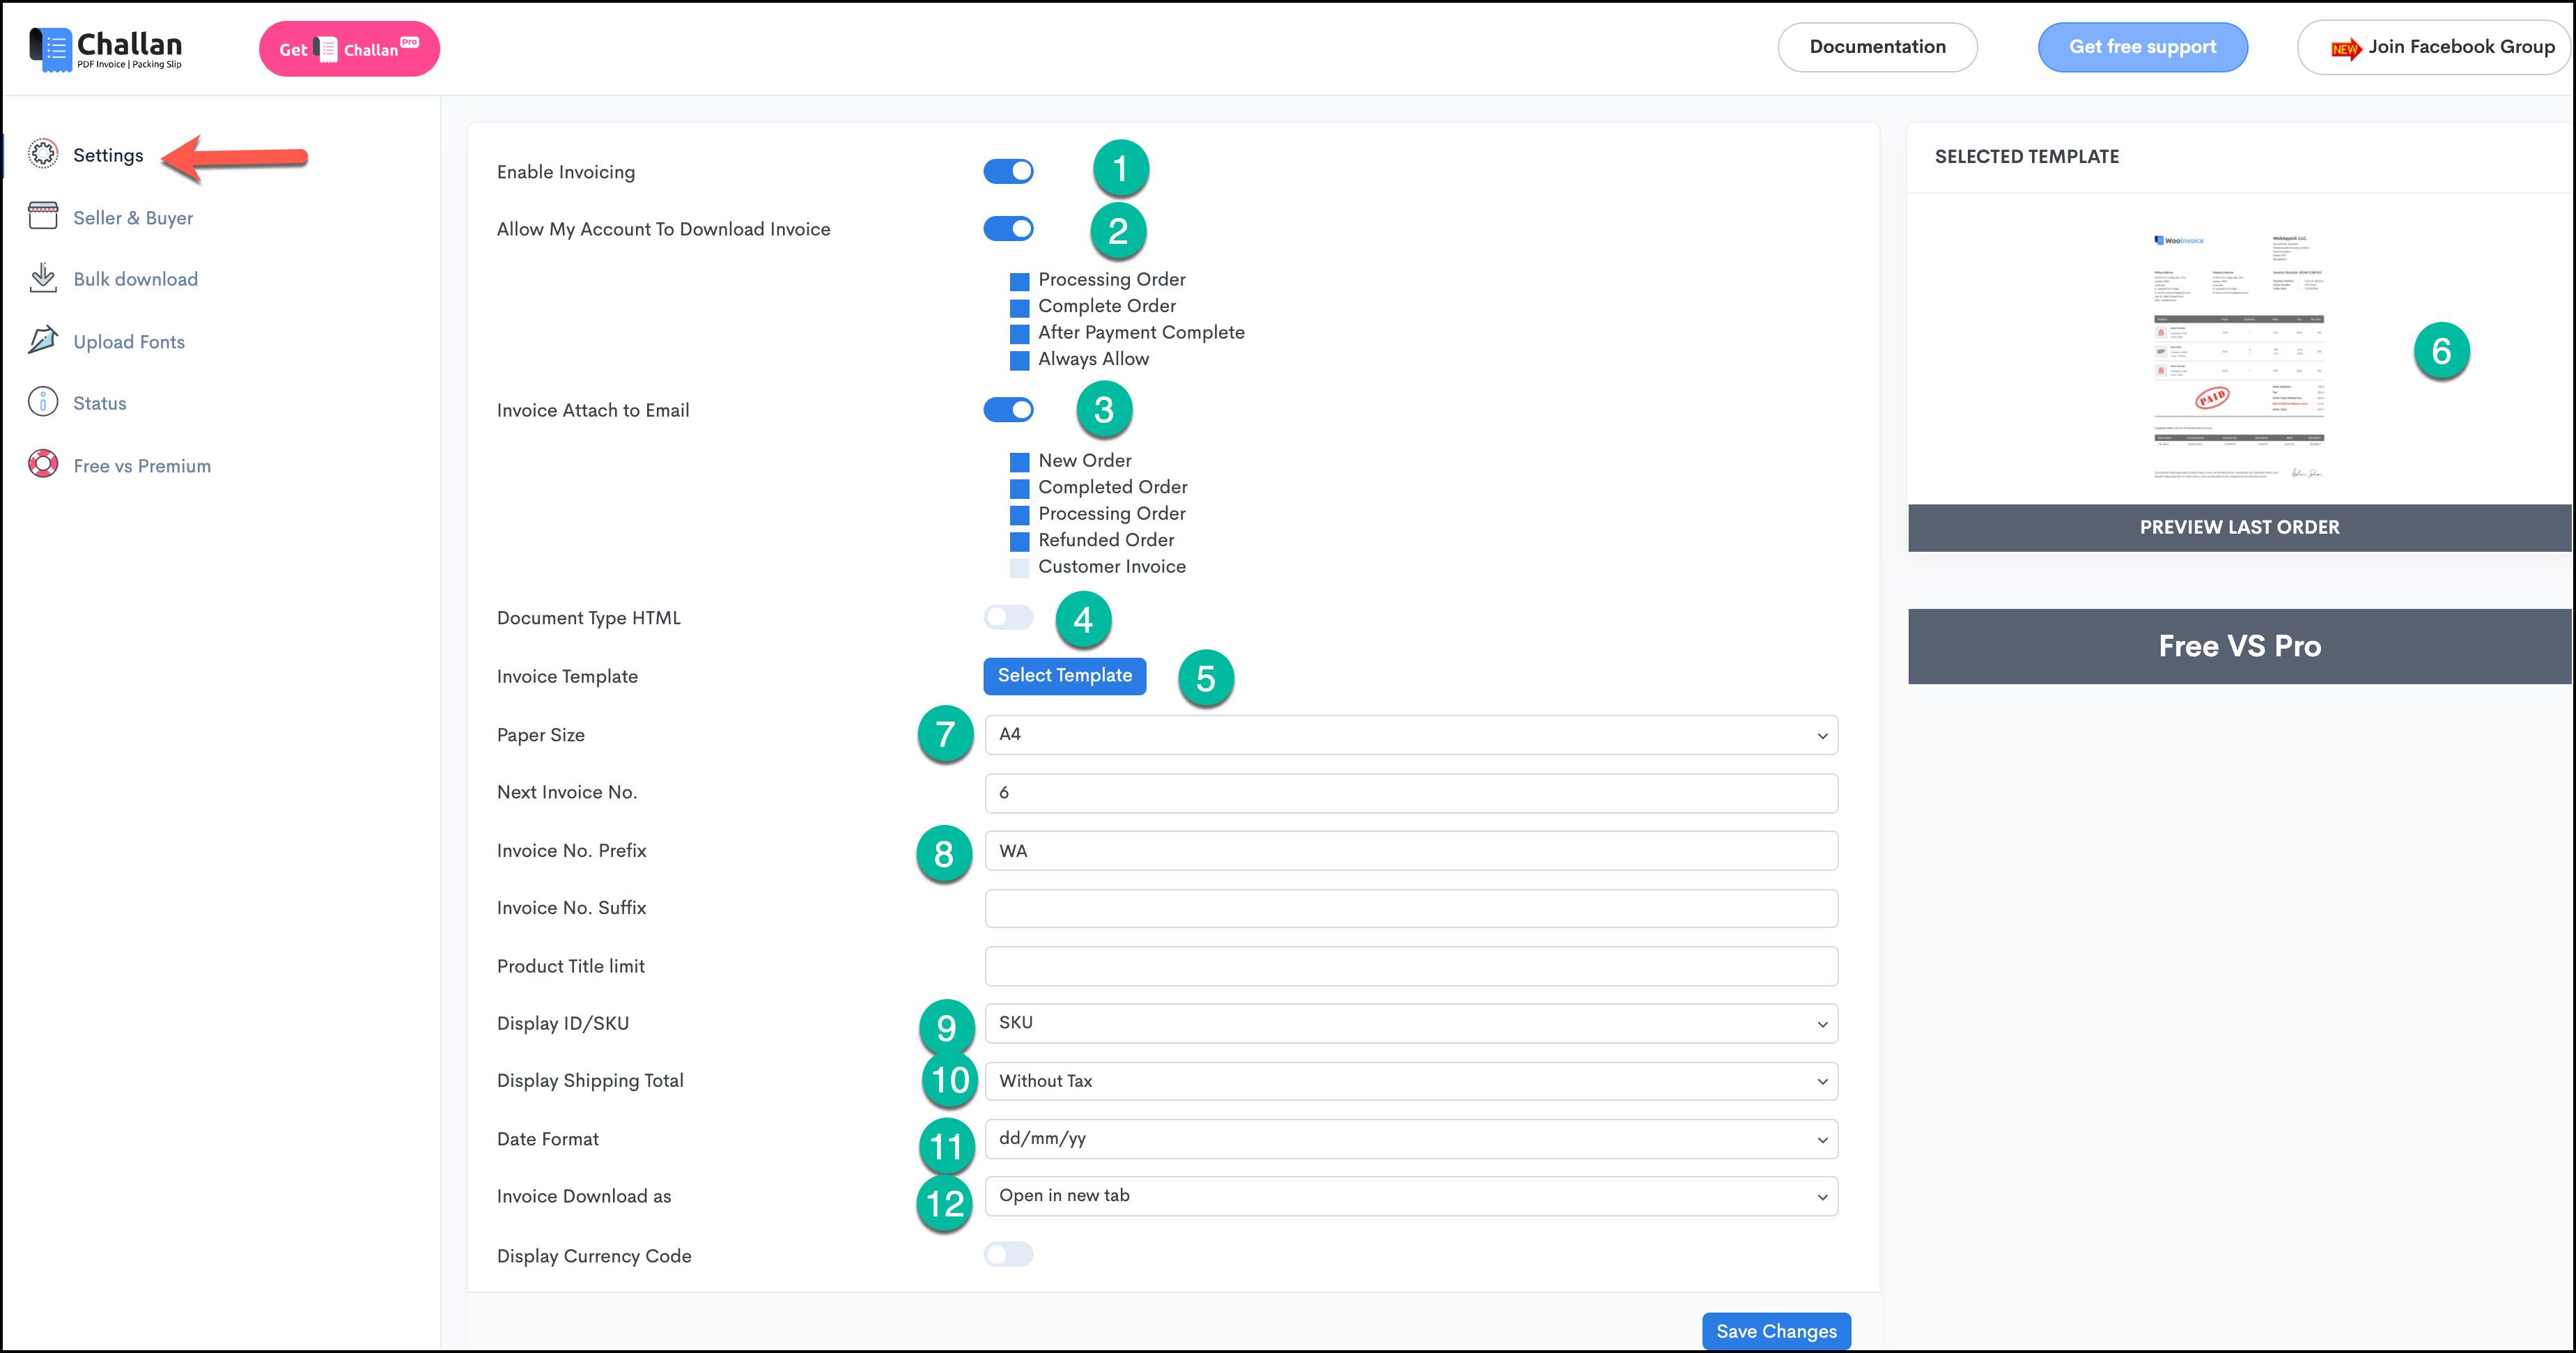 Challan Settings - PDF Invoice generator